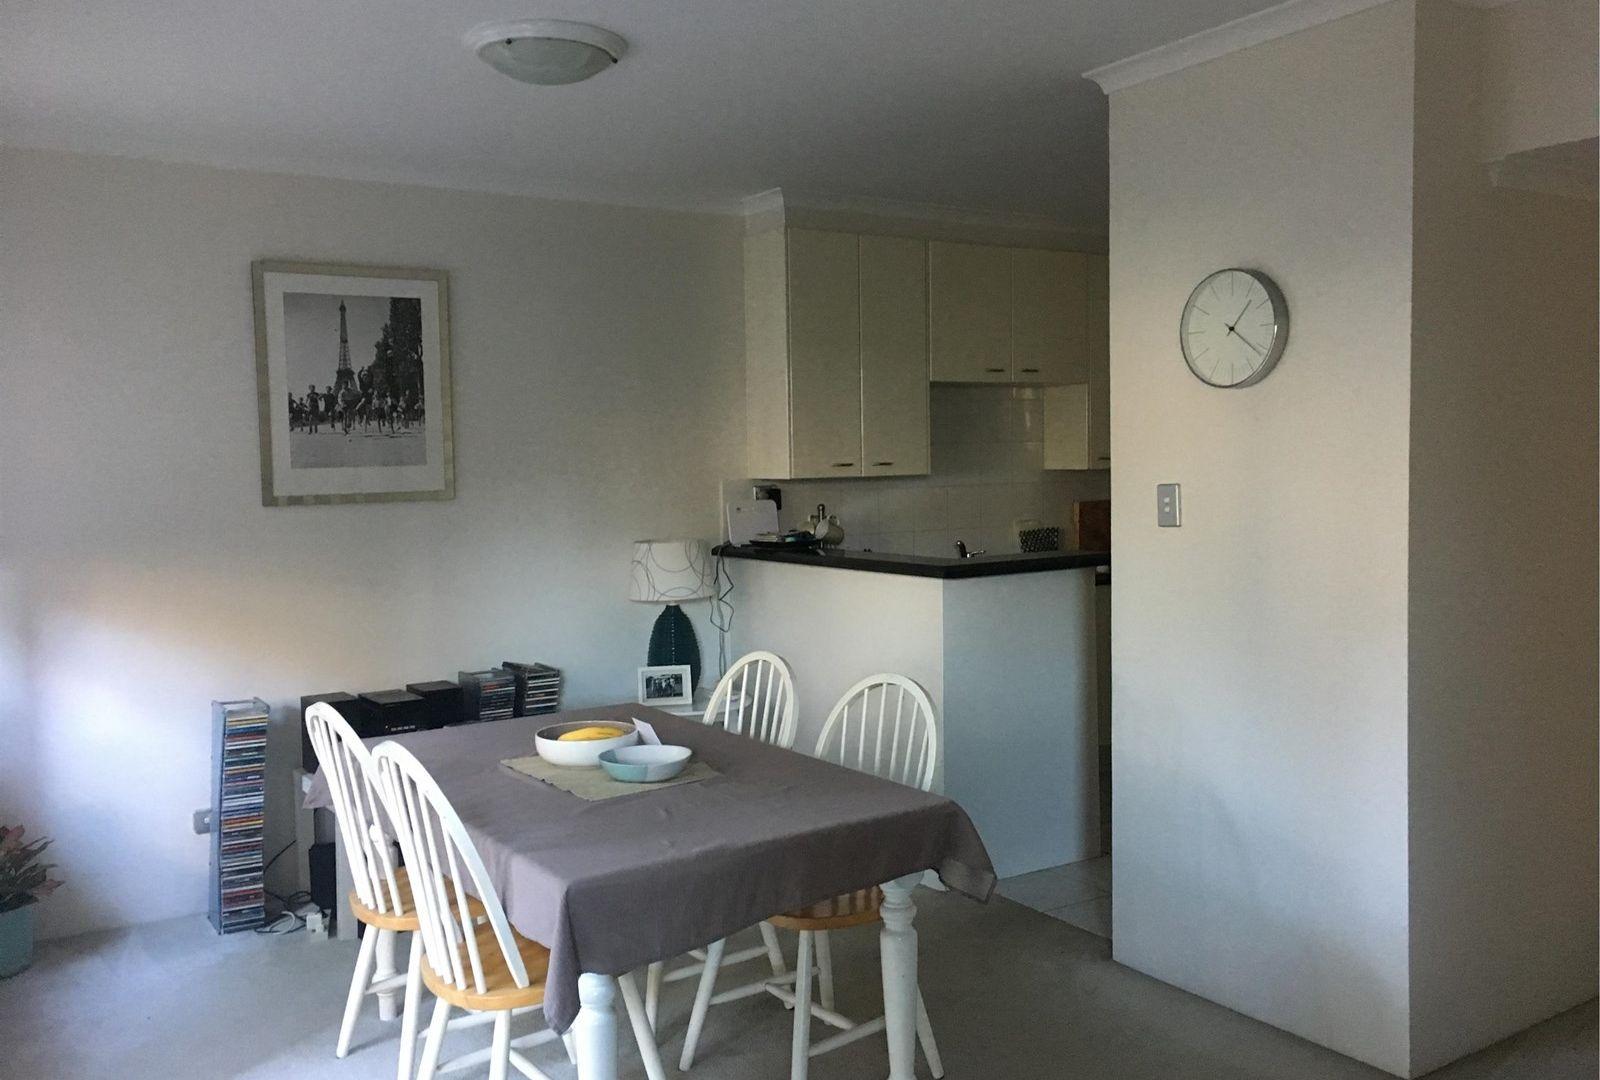 44/1 Hyam, Balmain NSW 2041, Image 1